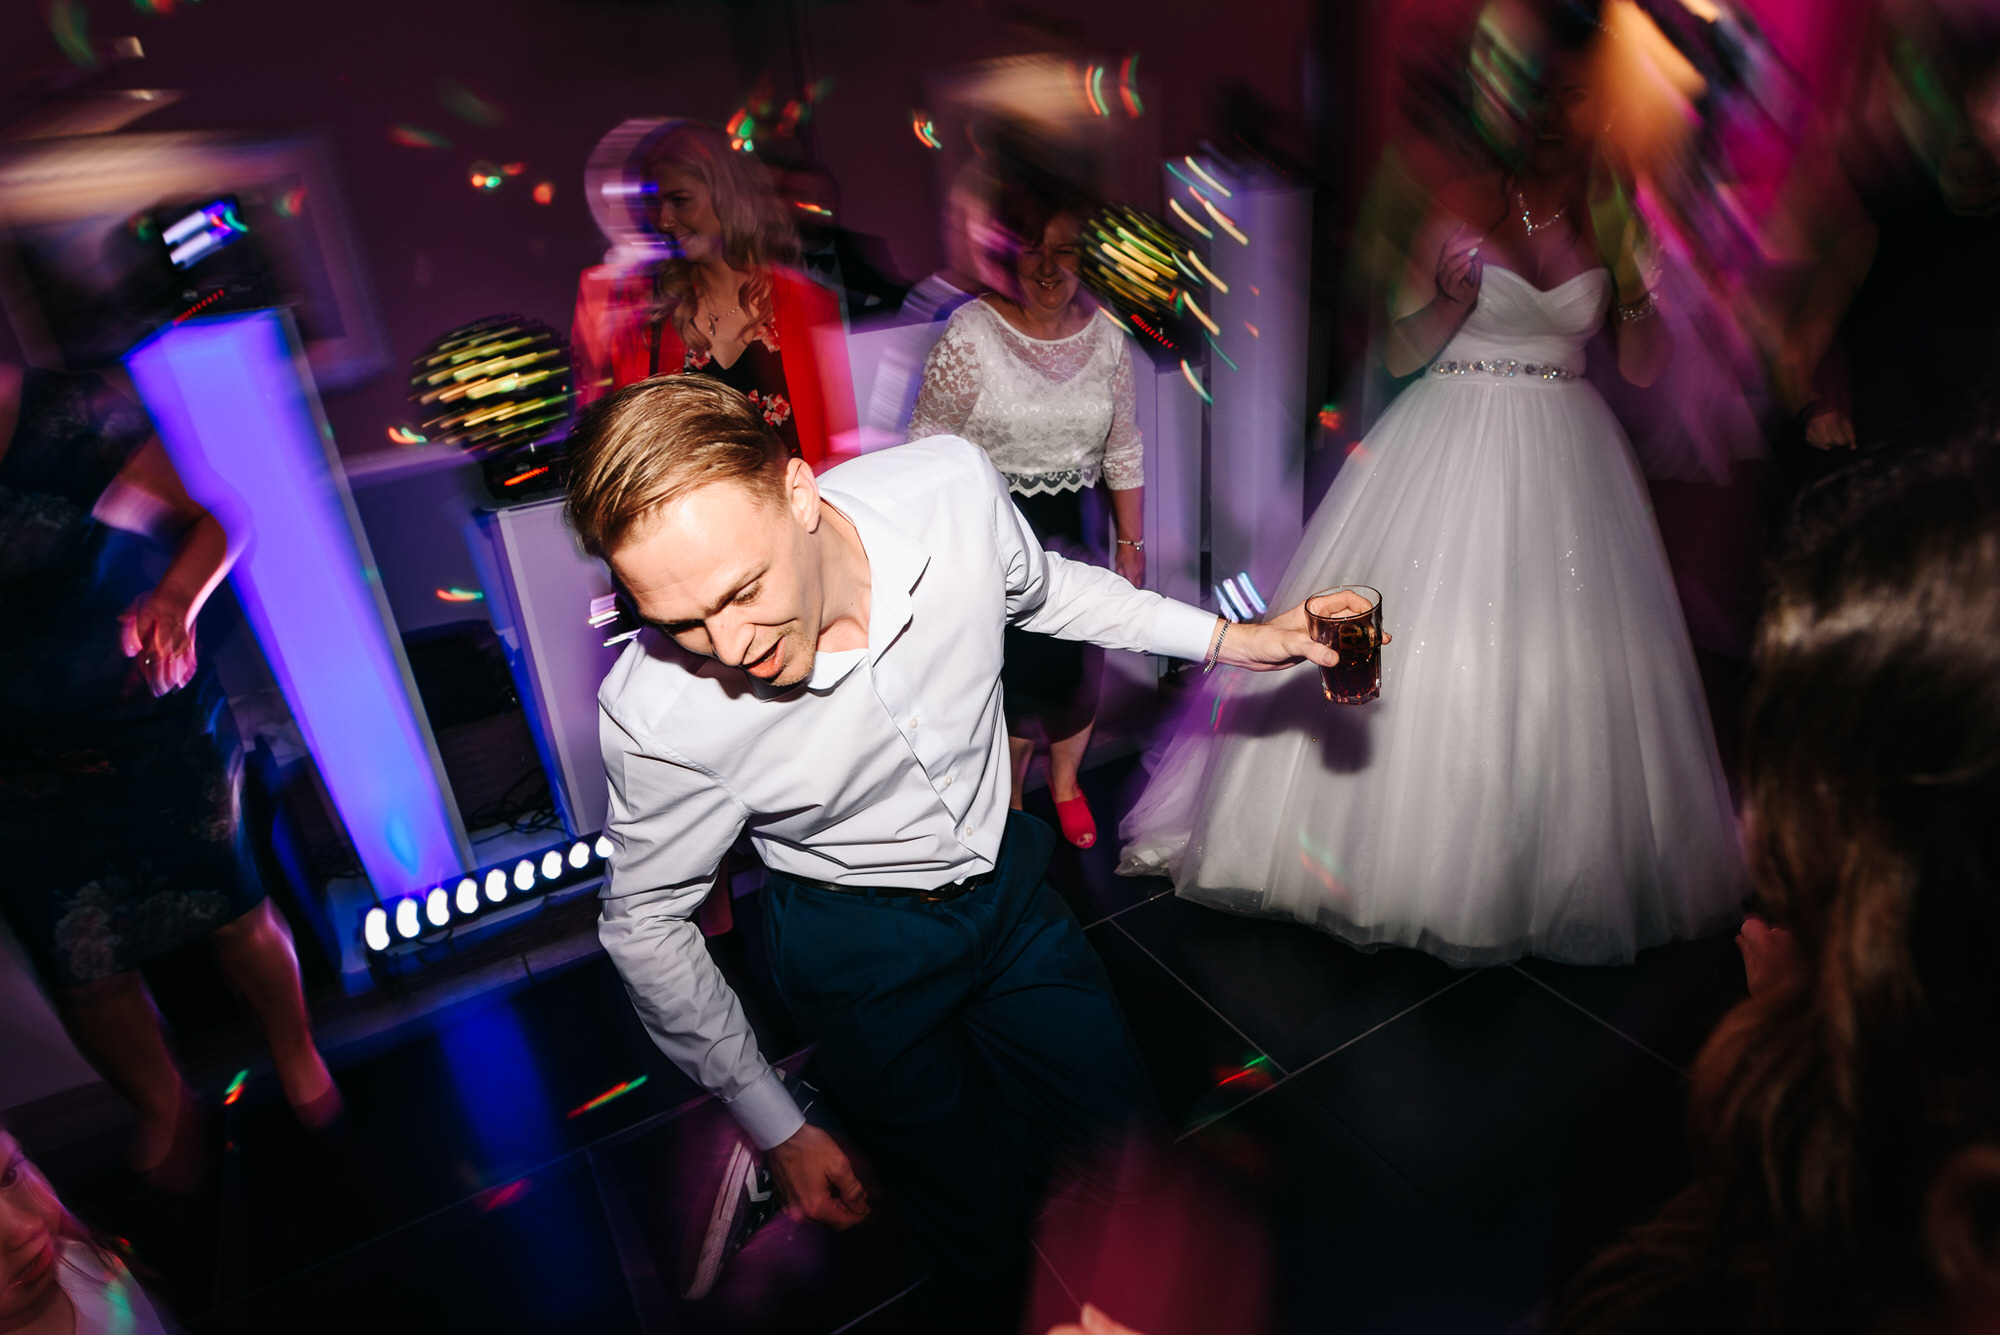 Best Of Yorkshire Wedding Photography 2017 - Martyn Hand-90.jpg